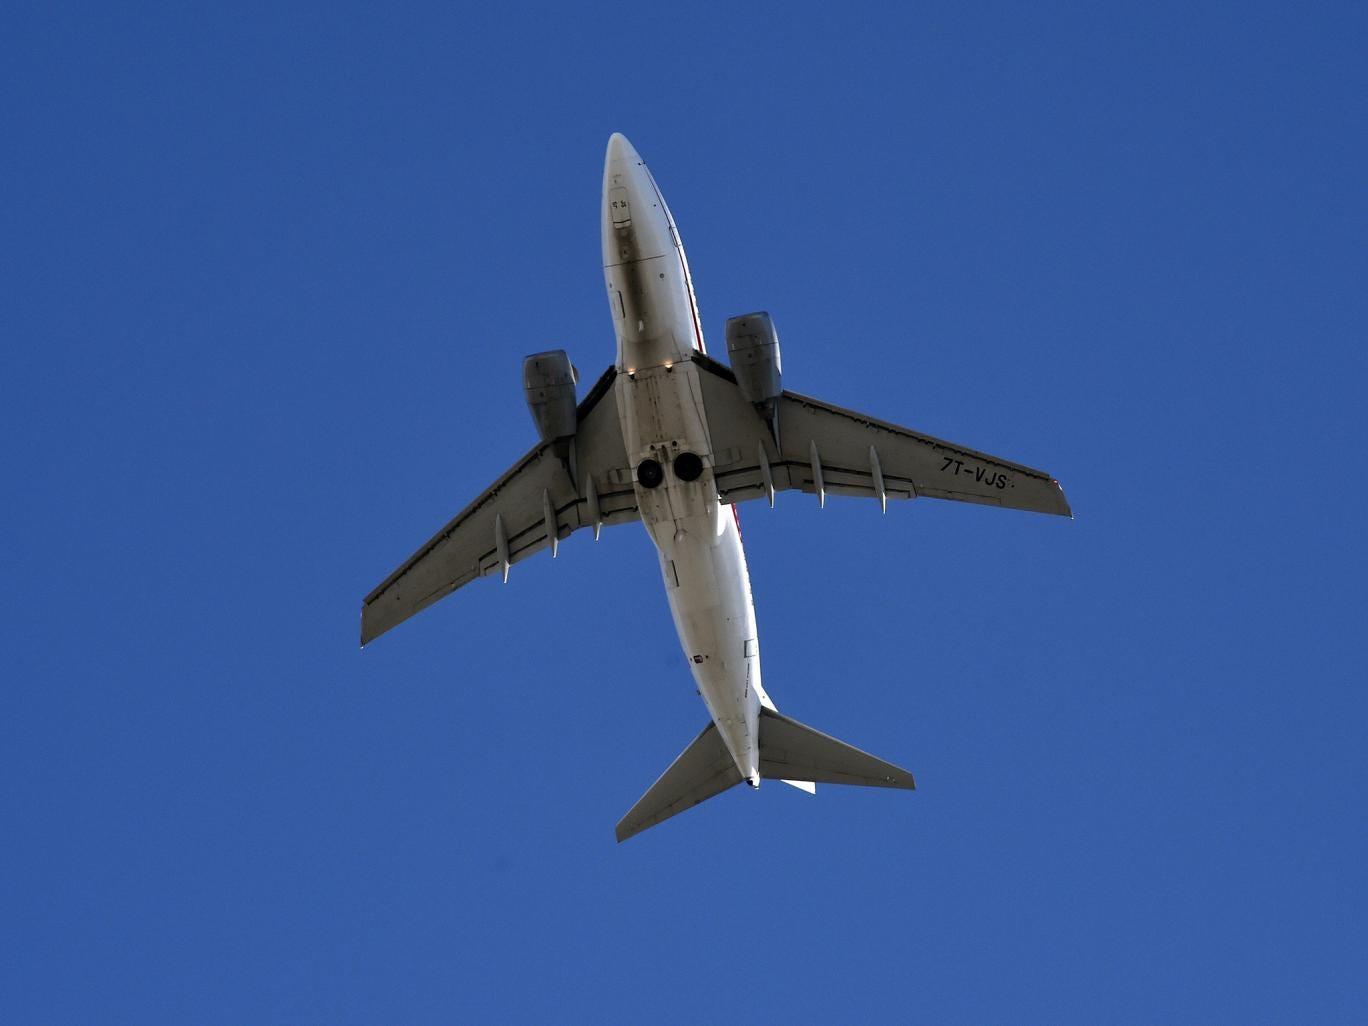 into planes  ampquot15 to 20 Plane